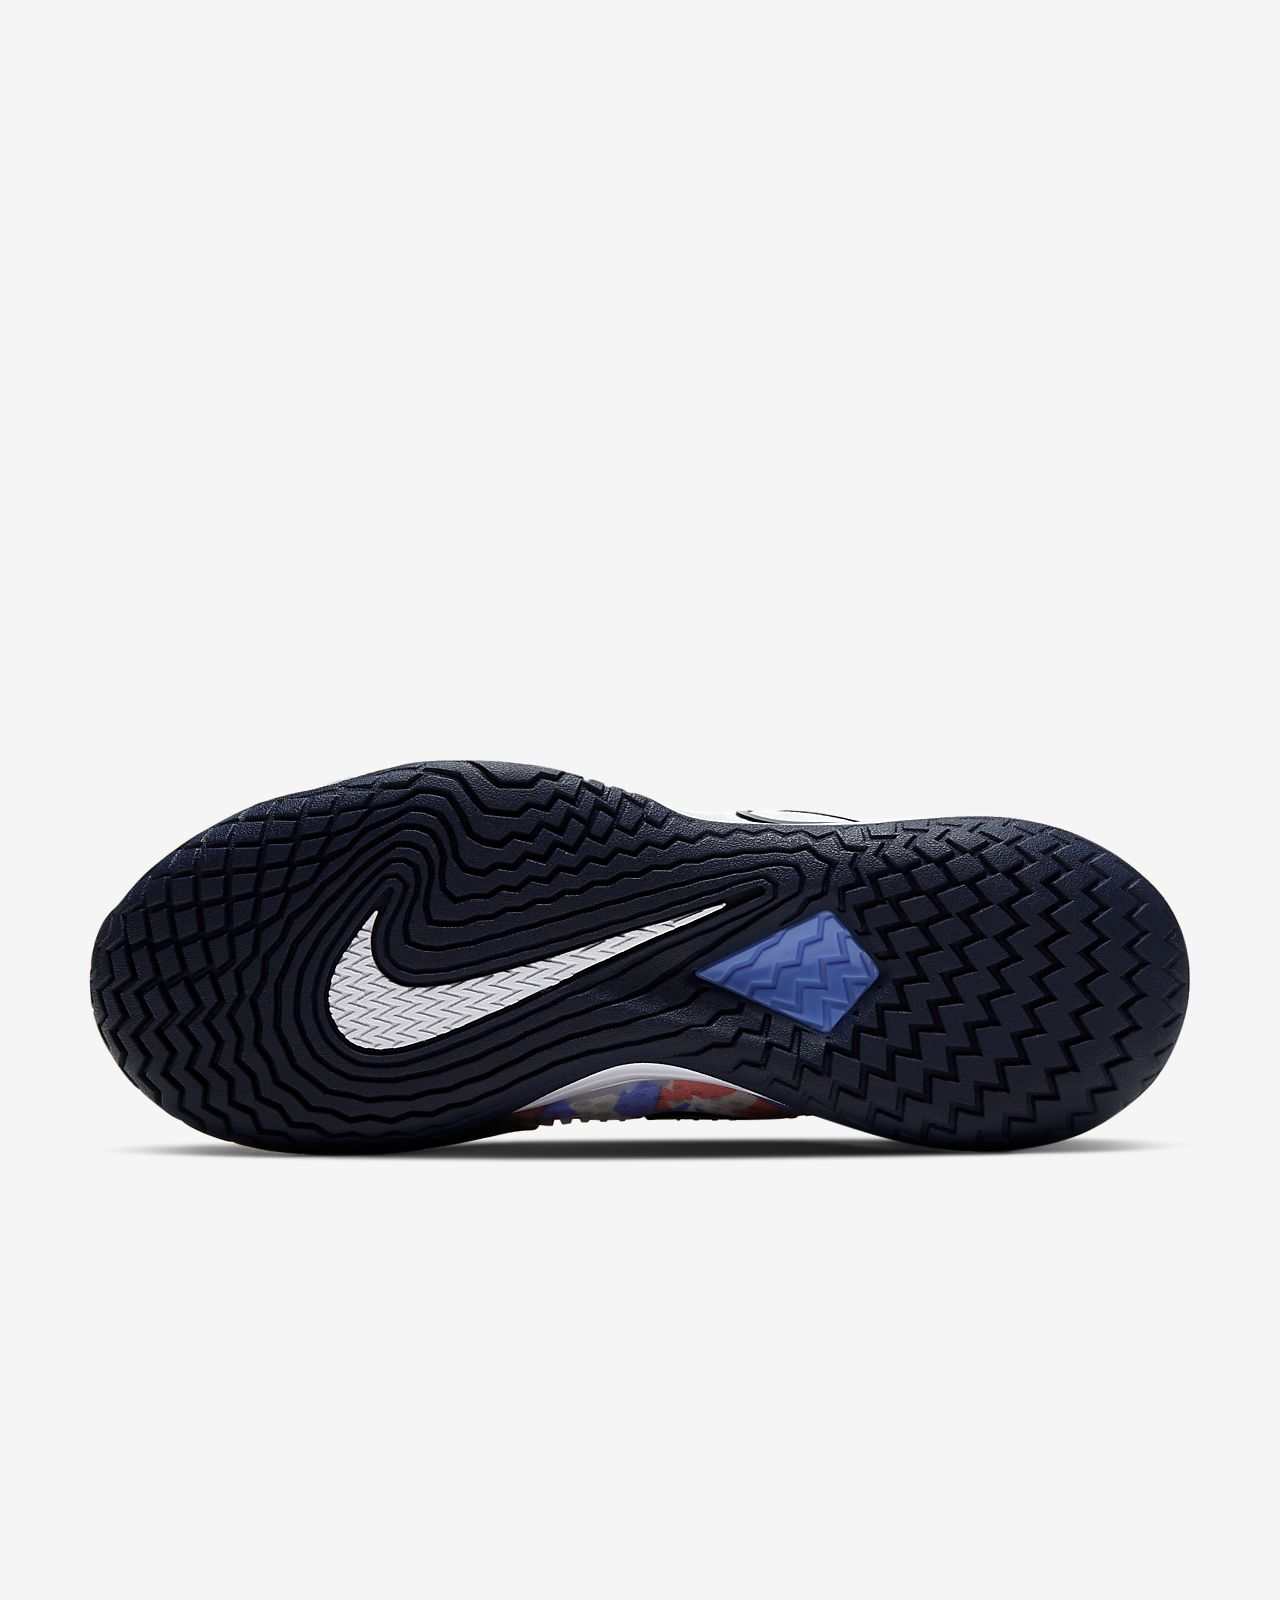 Scarpa da tennis per campi in cemento NikeCourt Air Zoom Vapor Cage 4 Donna